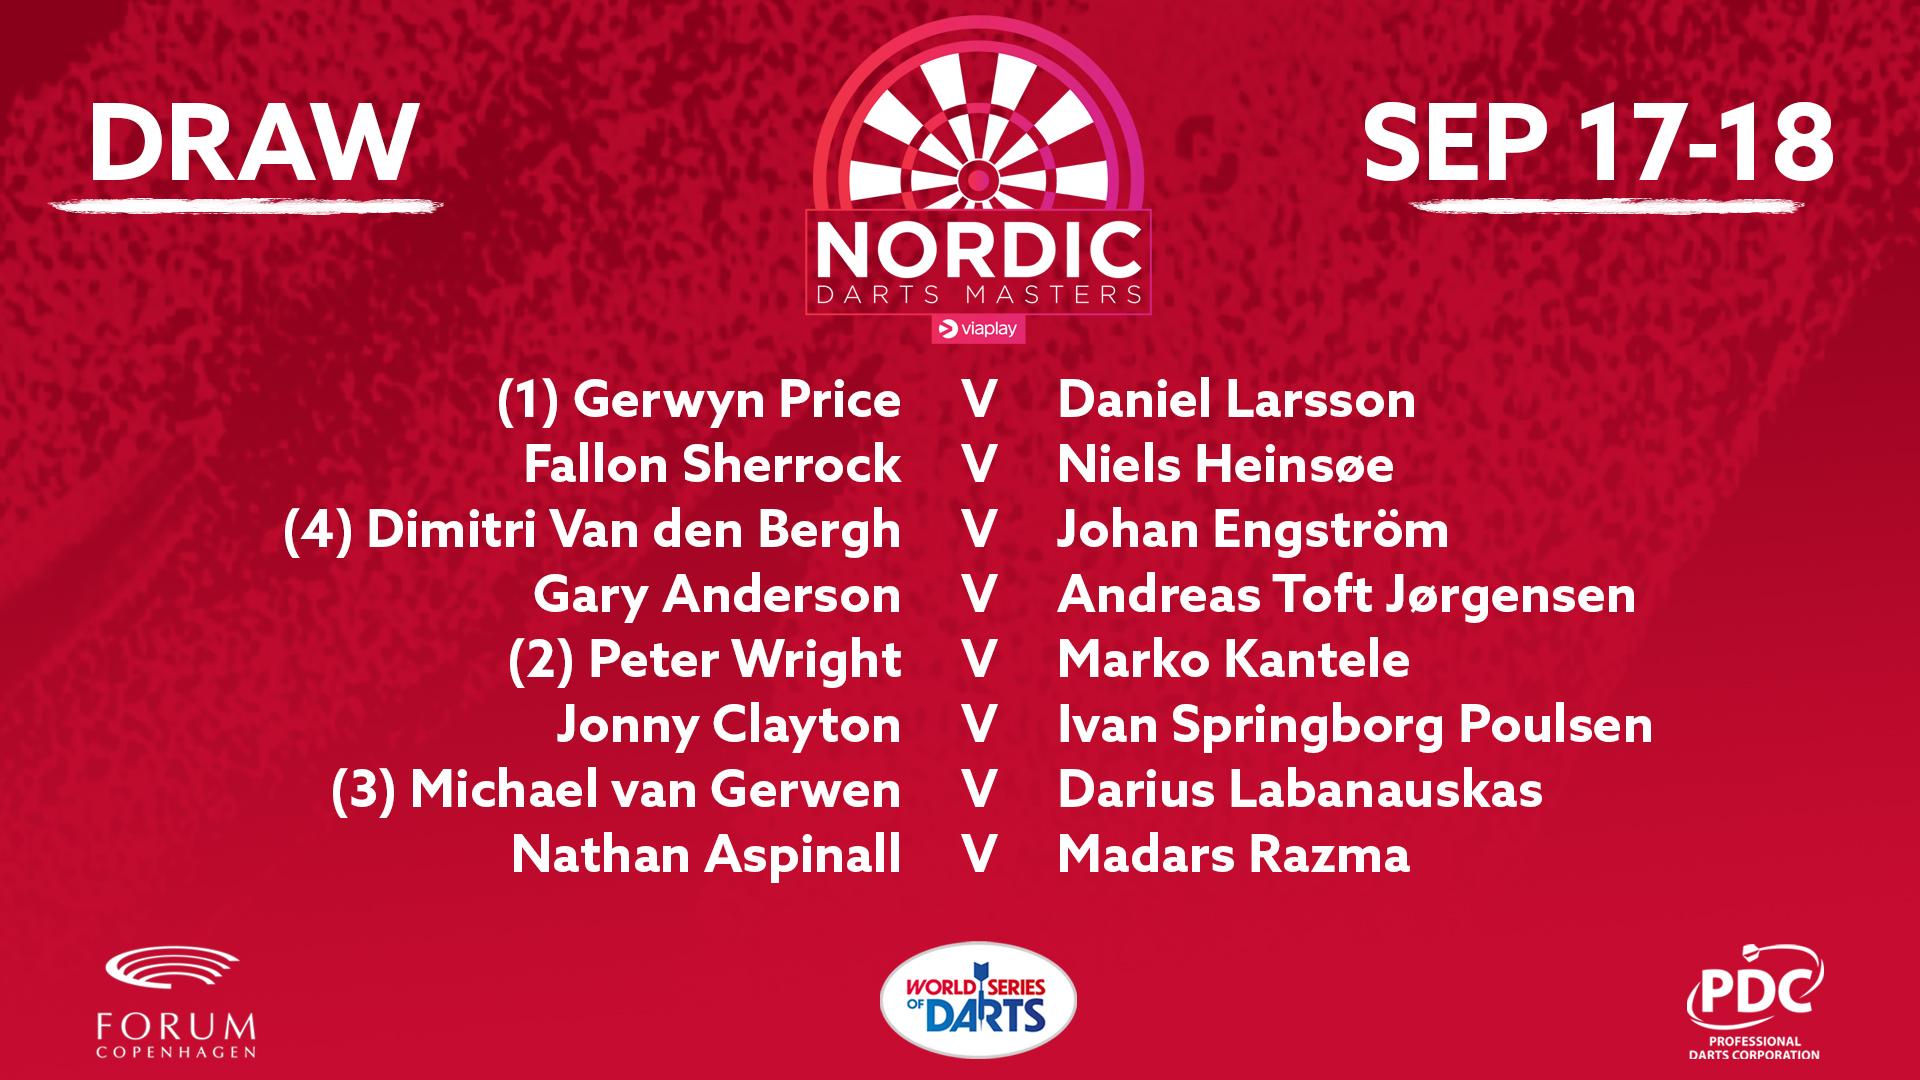 Nordic Darts Masters draw